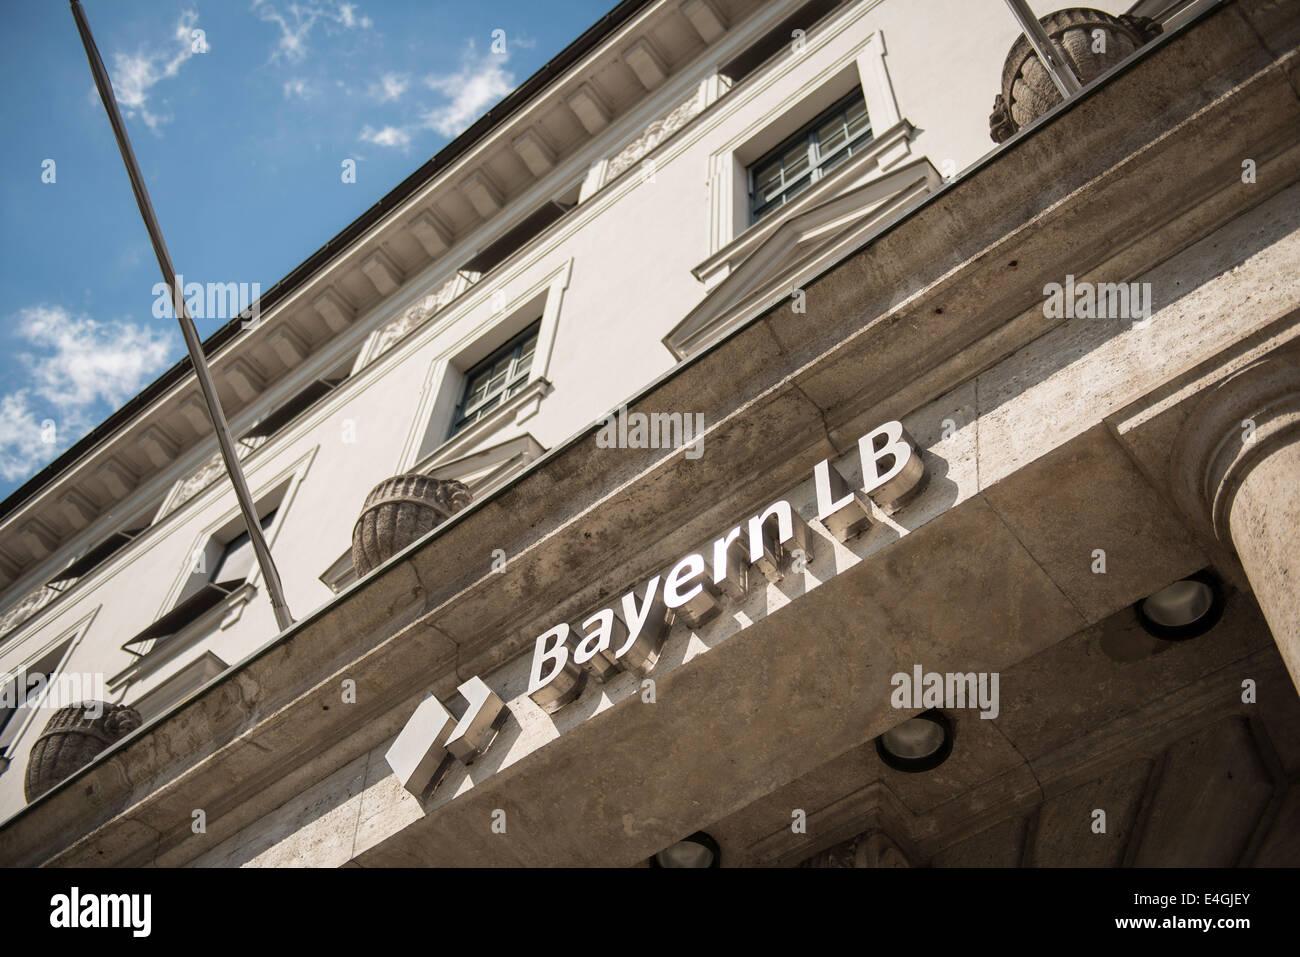 Bayern LB - Bayerische Landesbank, Munich, Germany - Stock Image